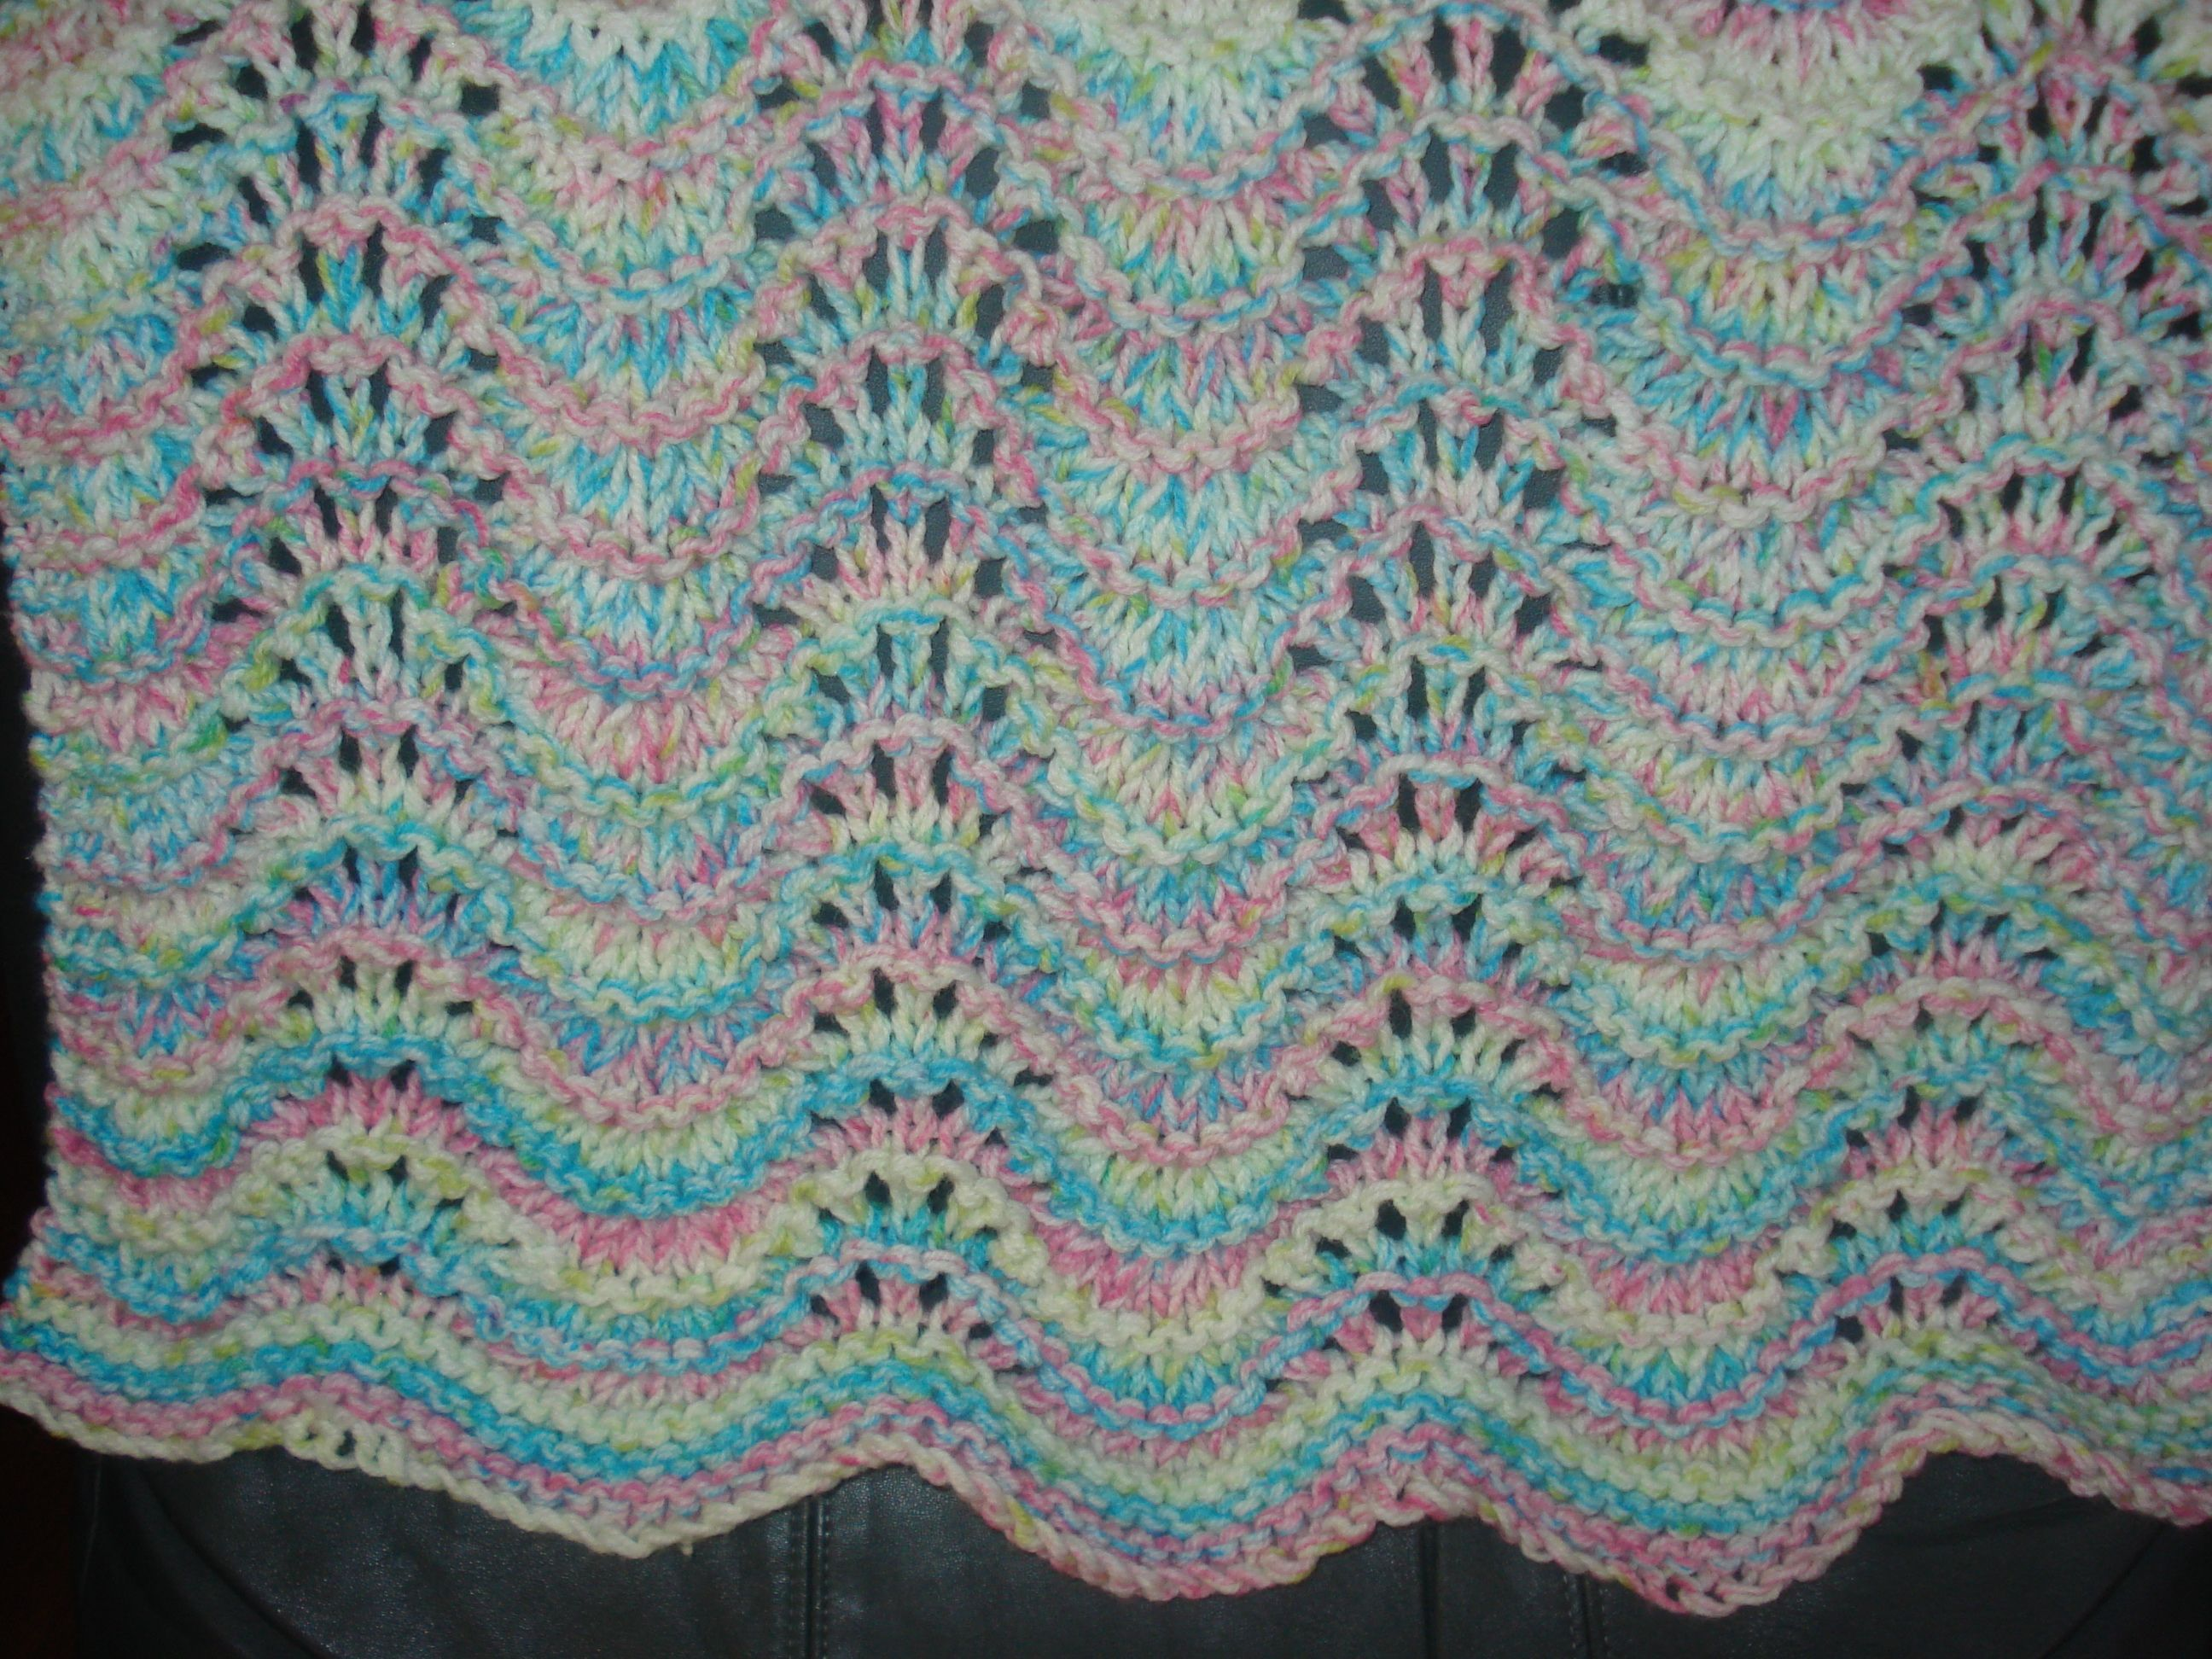 Pin by Diane Brown on knitting/crocheting   Pinterest   Pattern ...